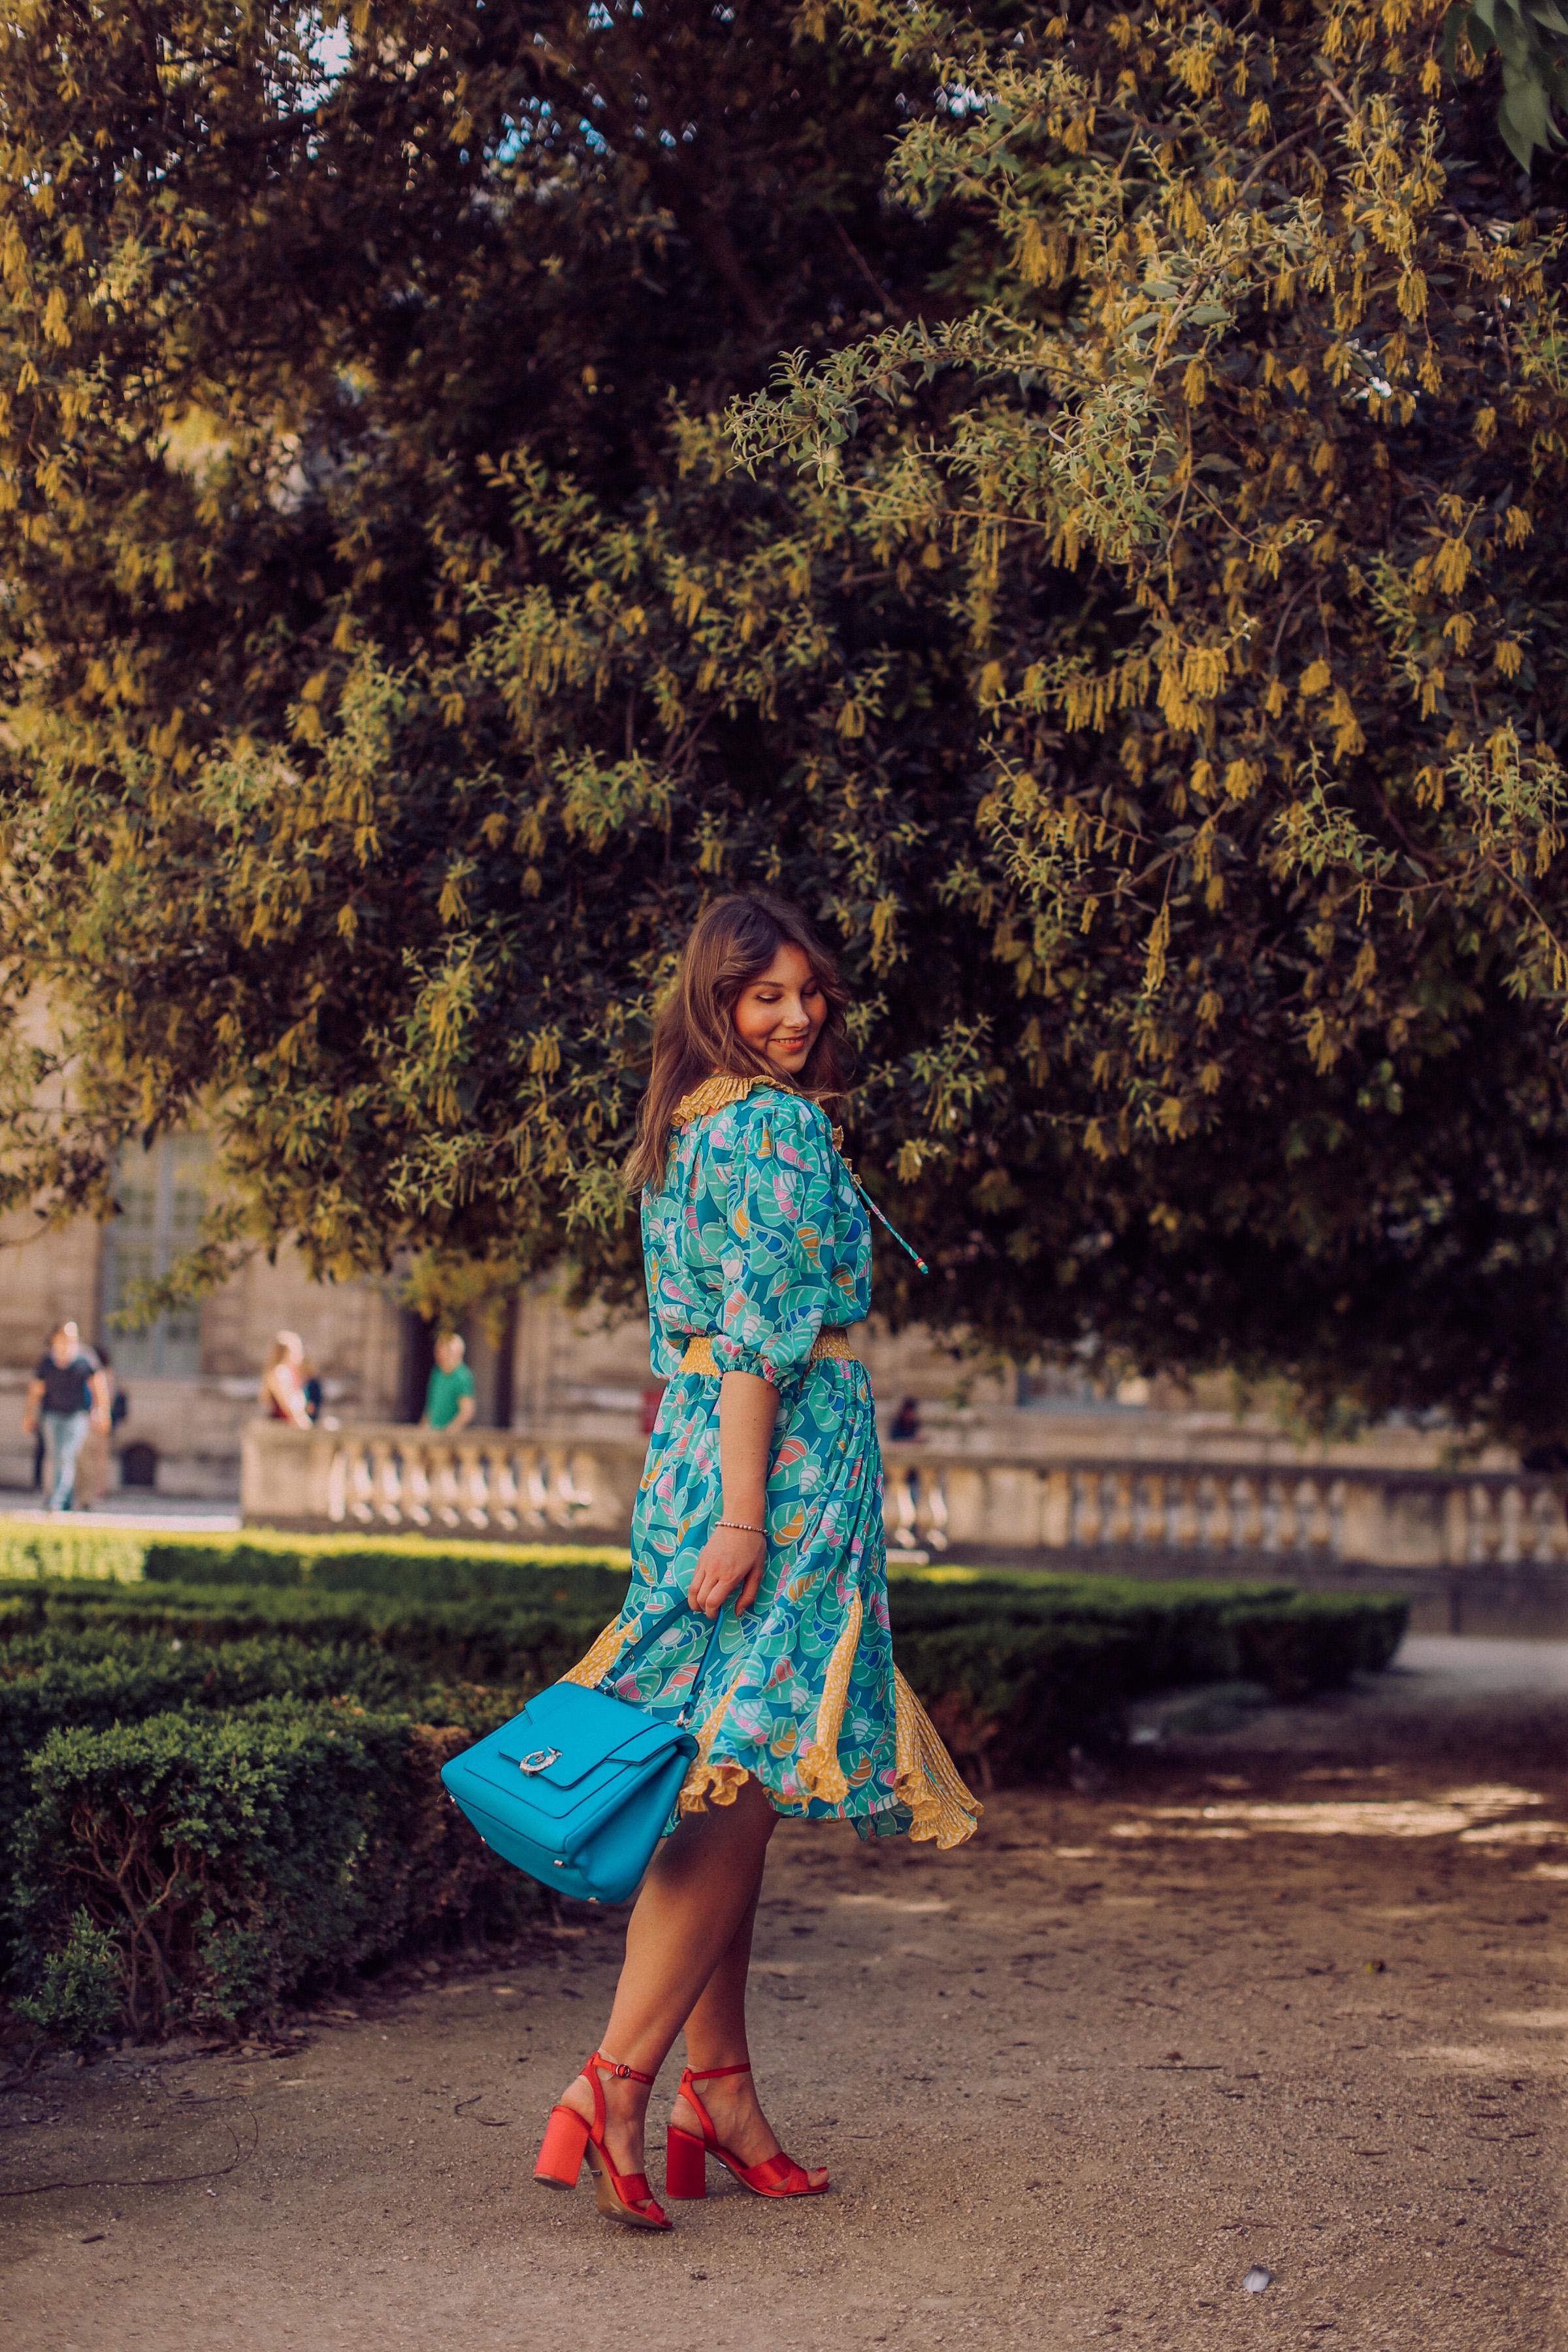 paris-vintage-dress-angelica-7073